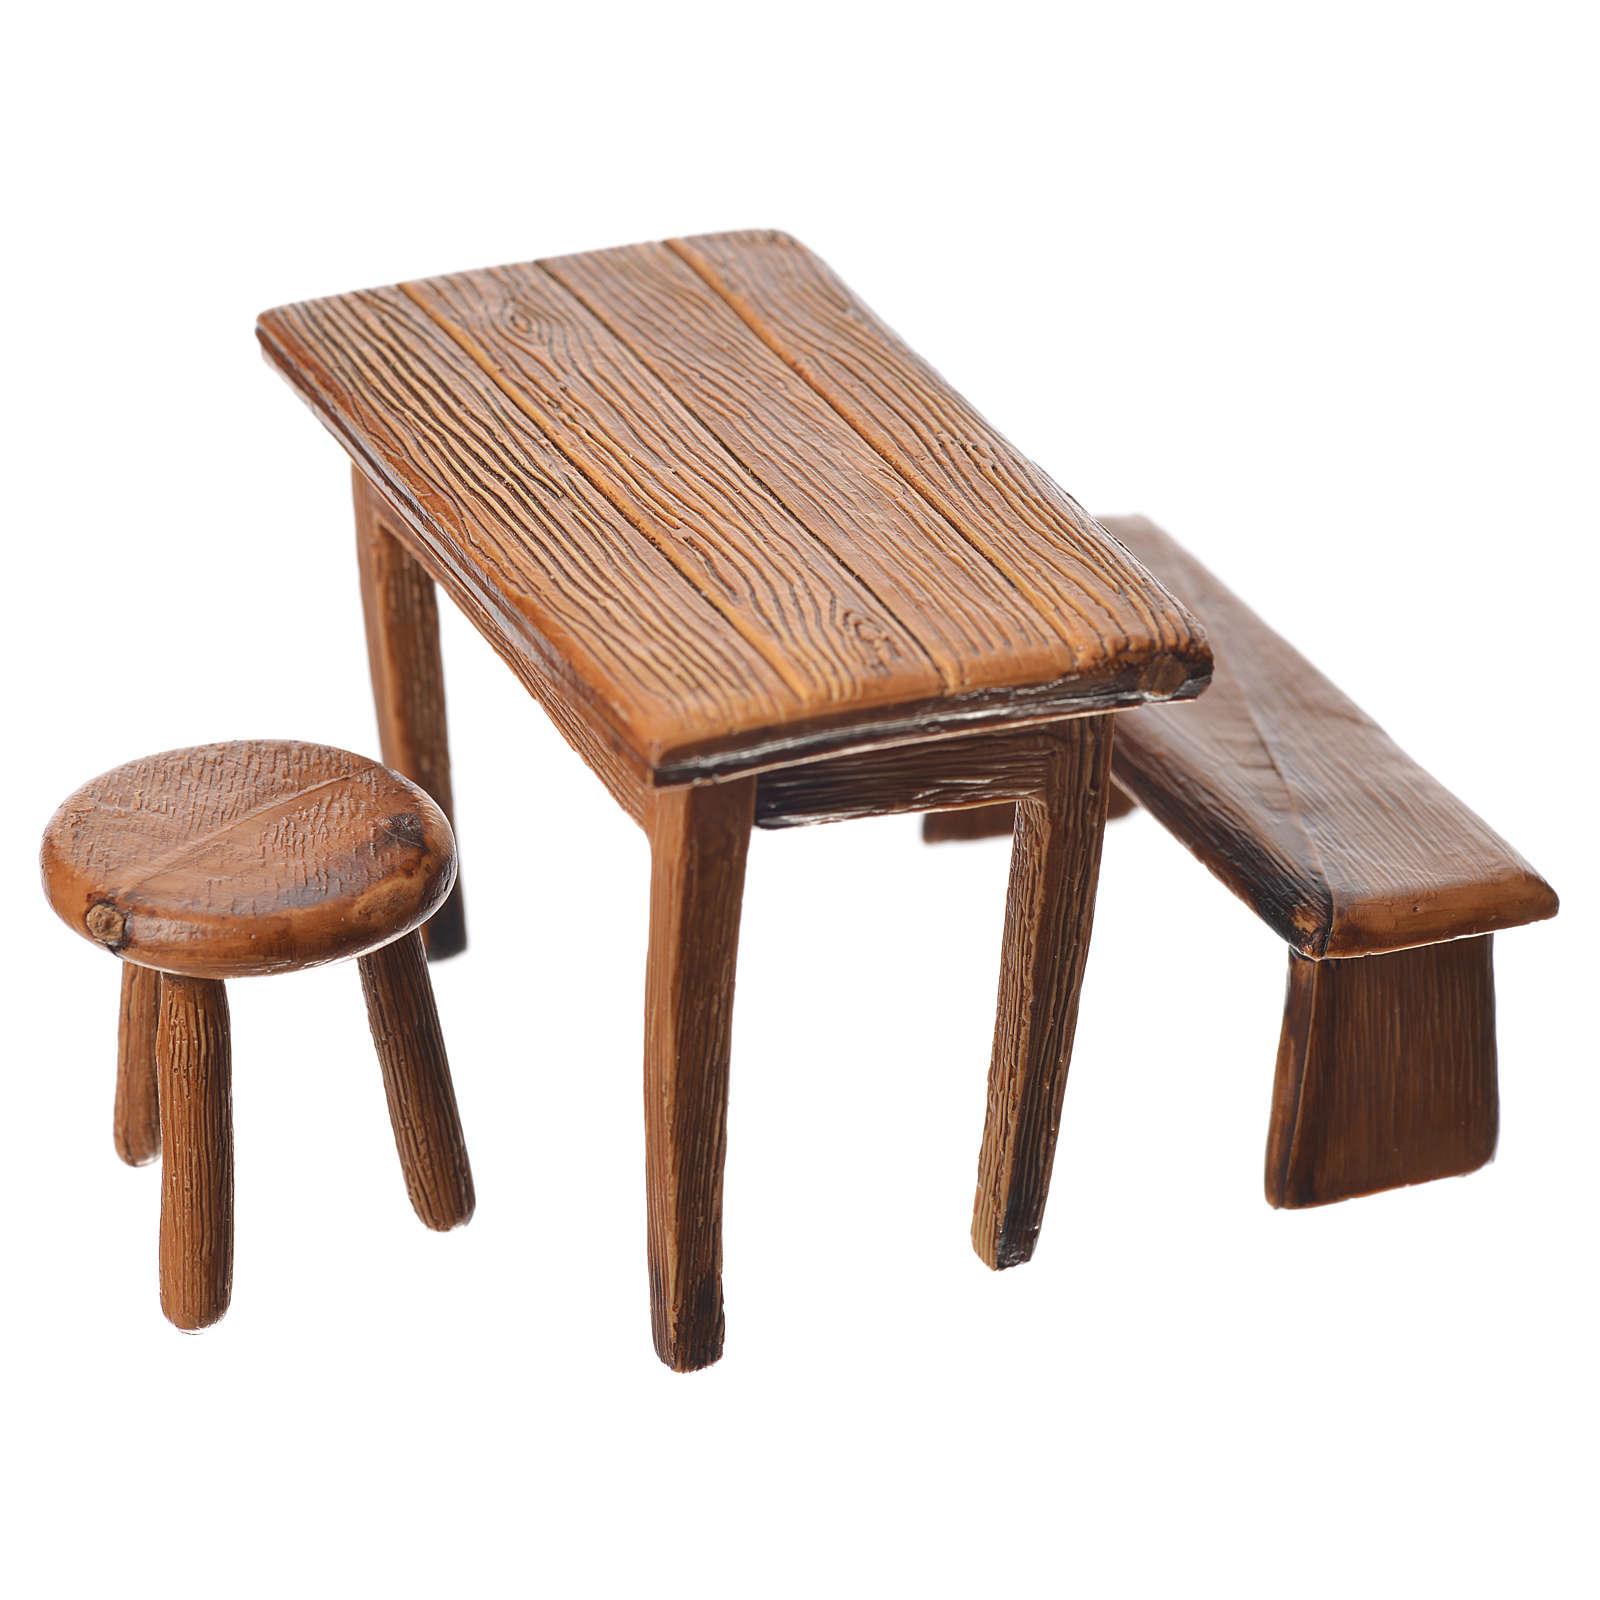 Table, bench, stool for Moranduzzo Nativity, 10cm 4